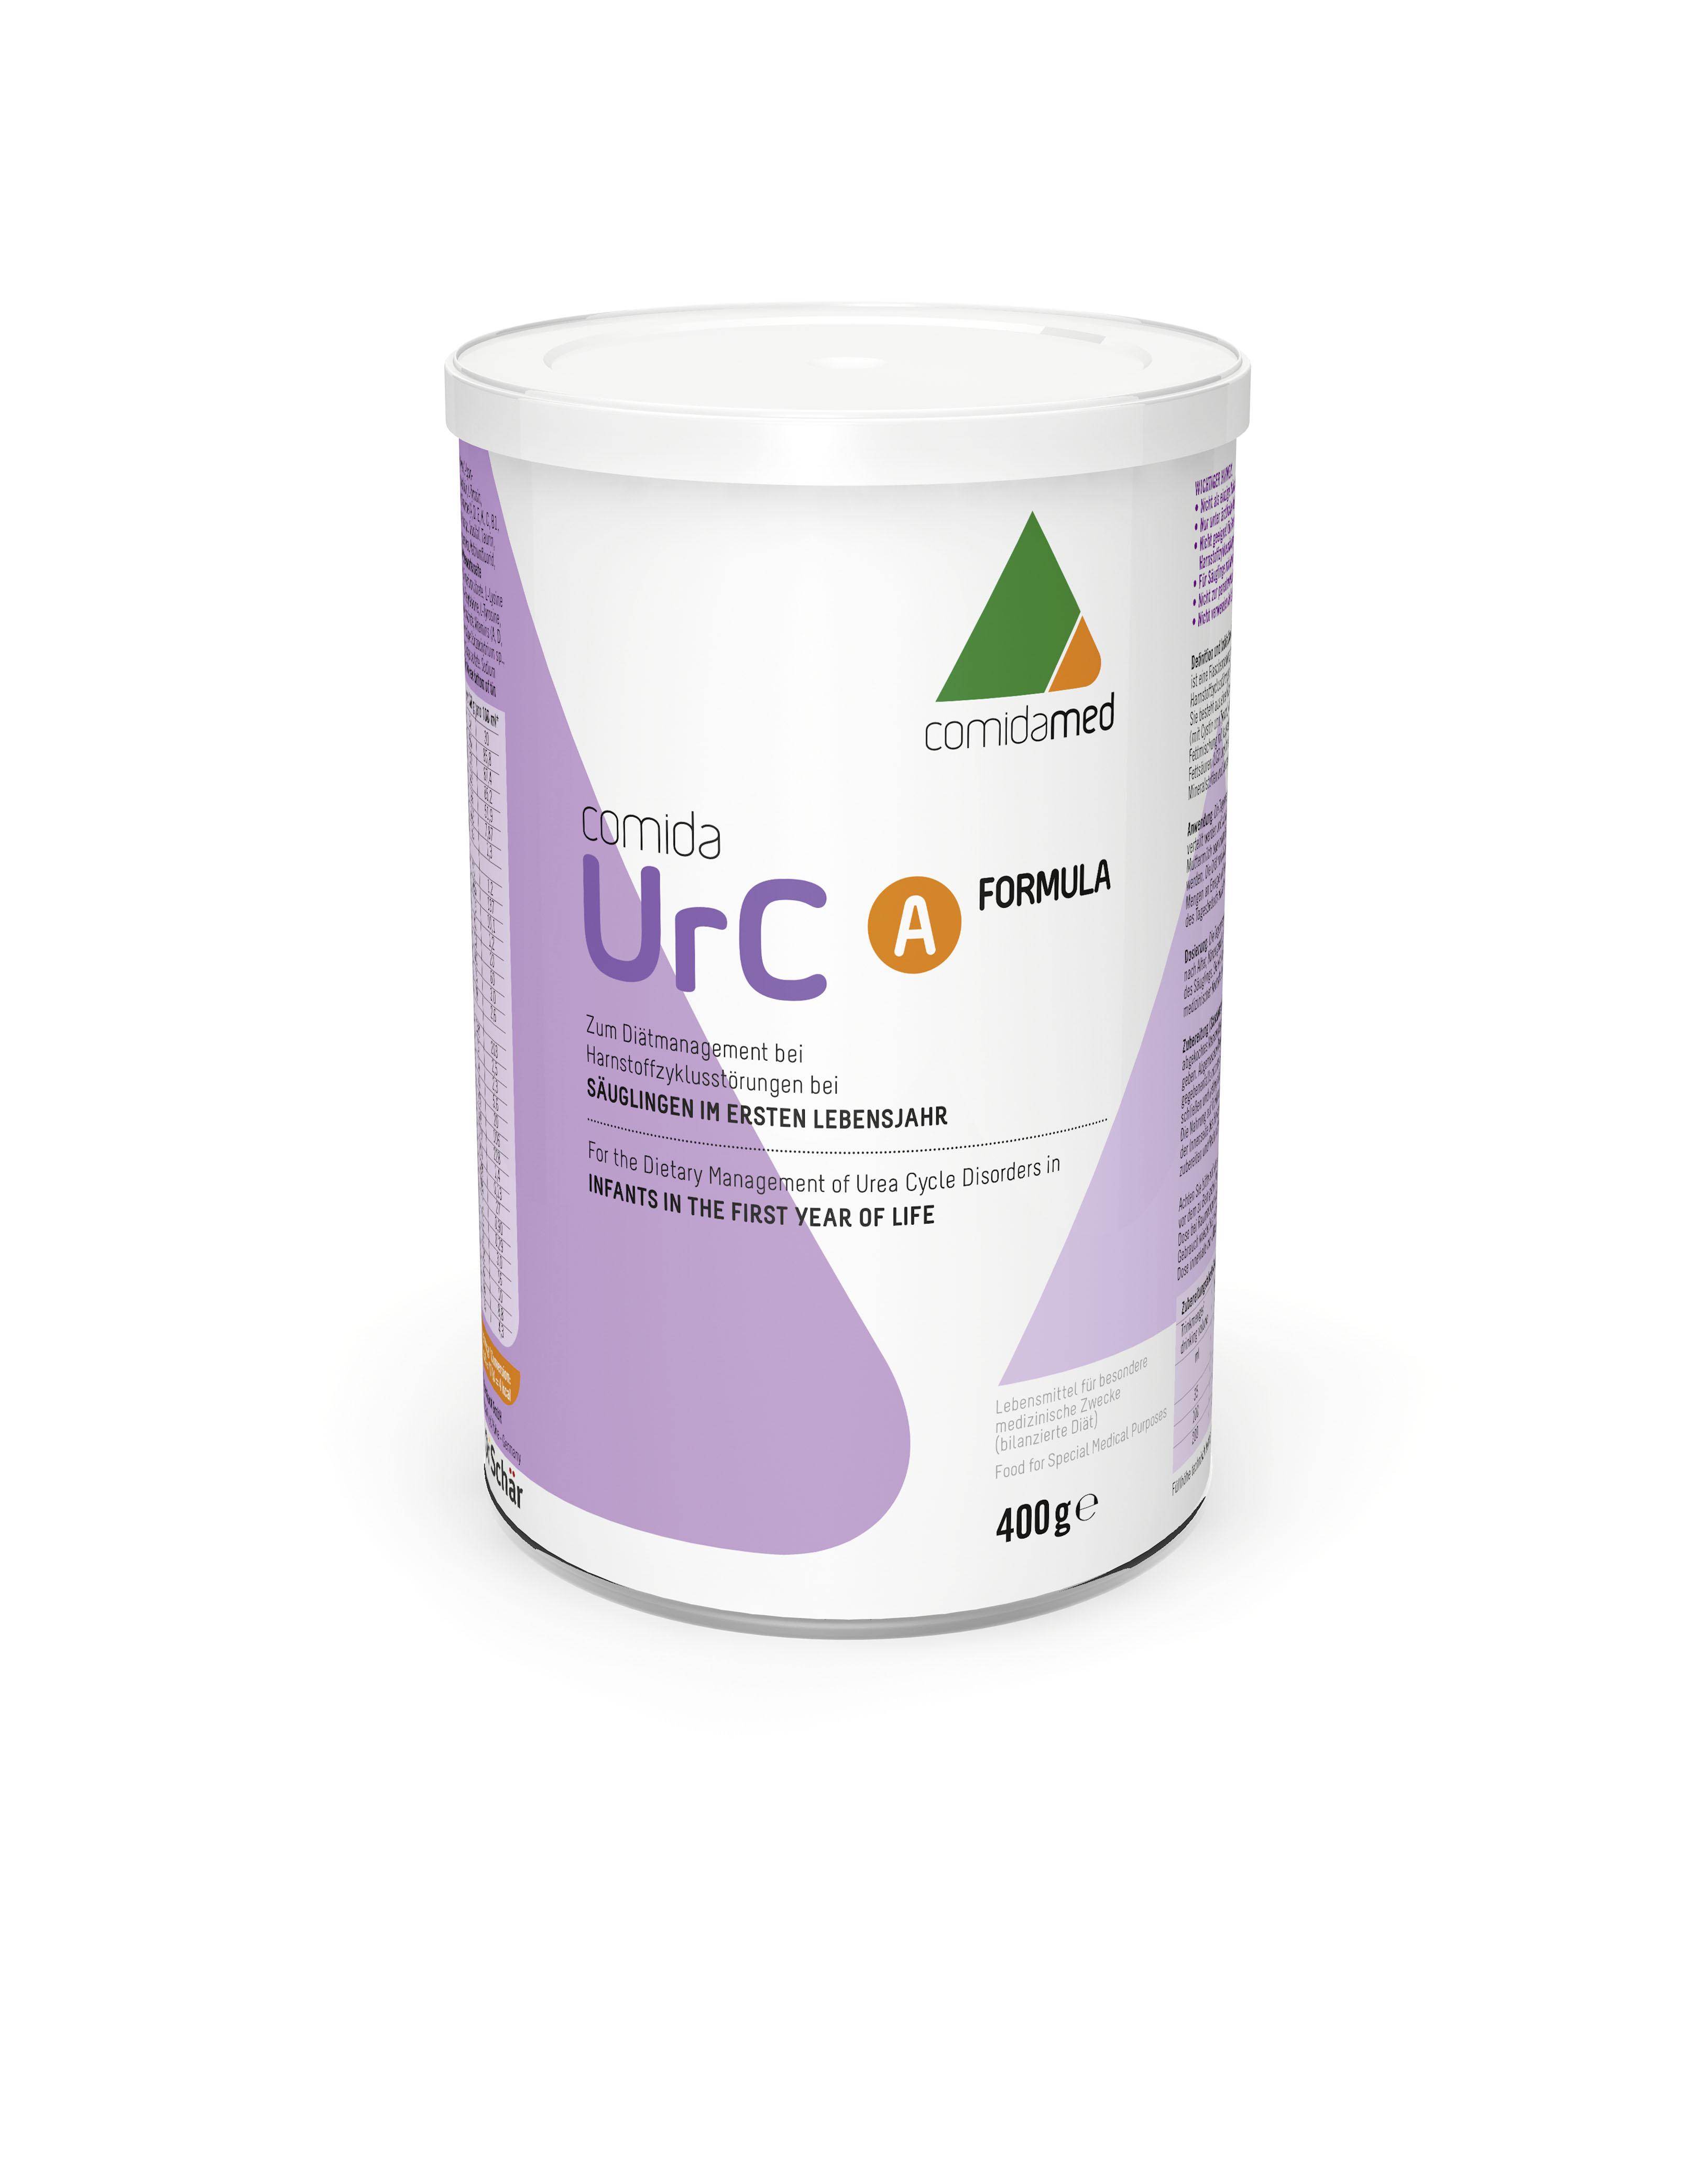 comida-UrC A FORMULA